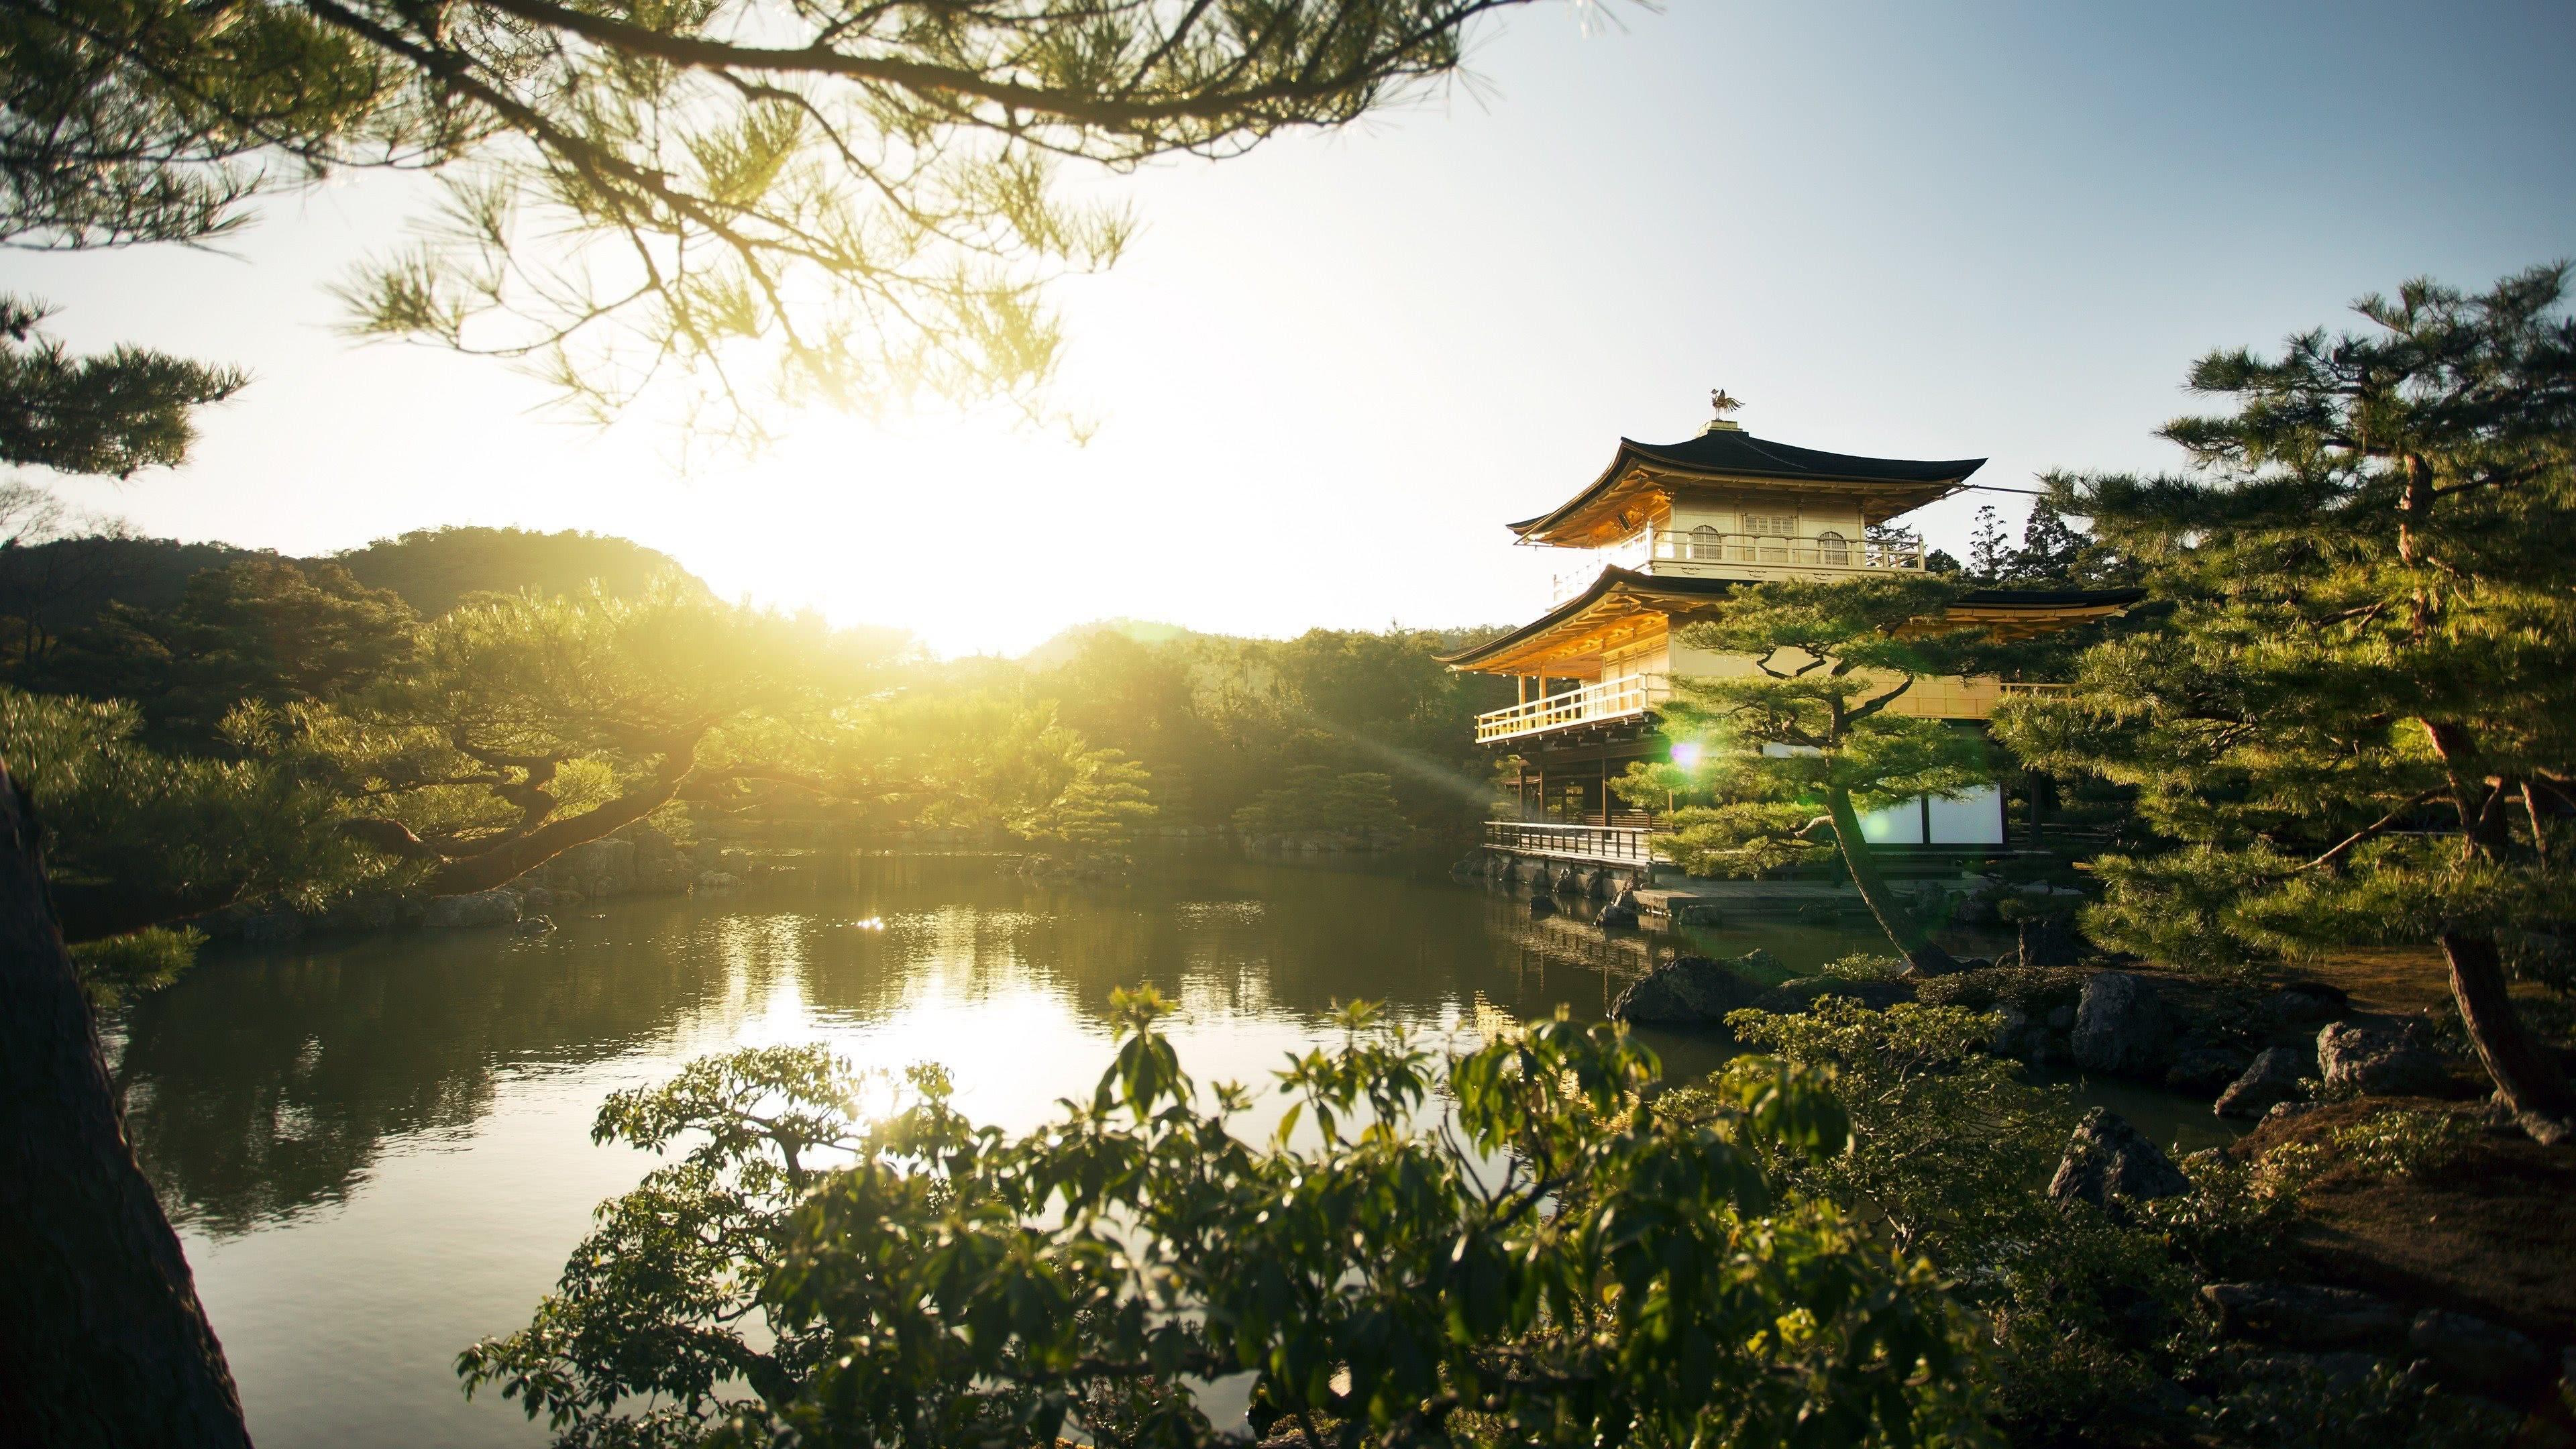 Cars Hd Mobile Wallpapers Temple Of The Golden Pavilion Kinkaku Ji Kyoto Uhd 4k